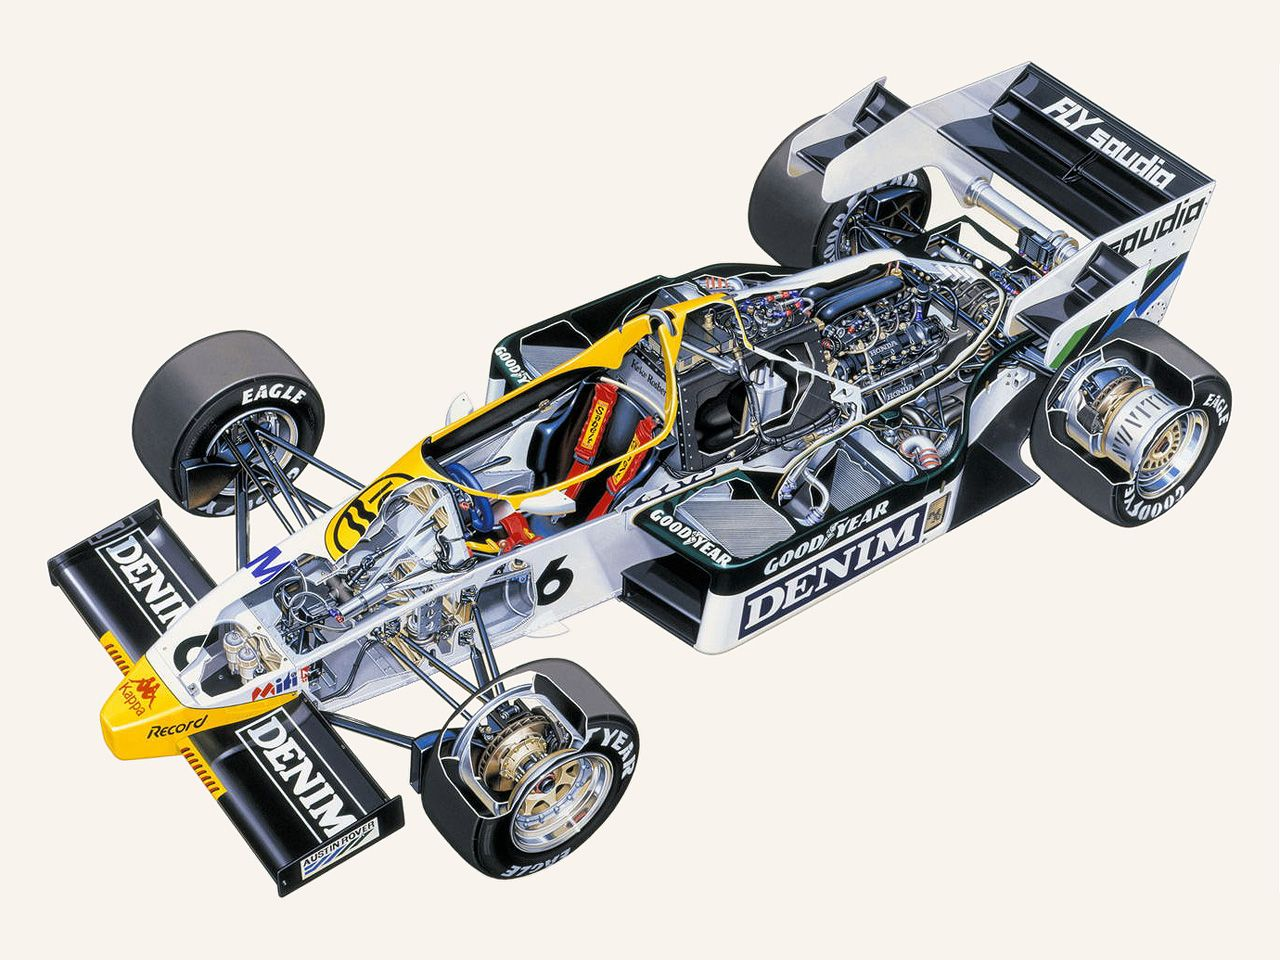 1983-1984 Williams FW09 - Illustration unatrributed